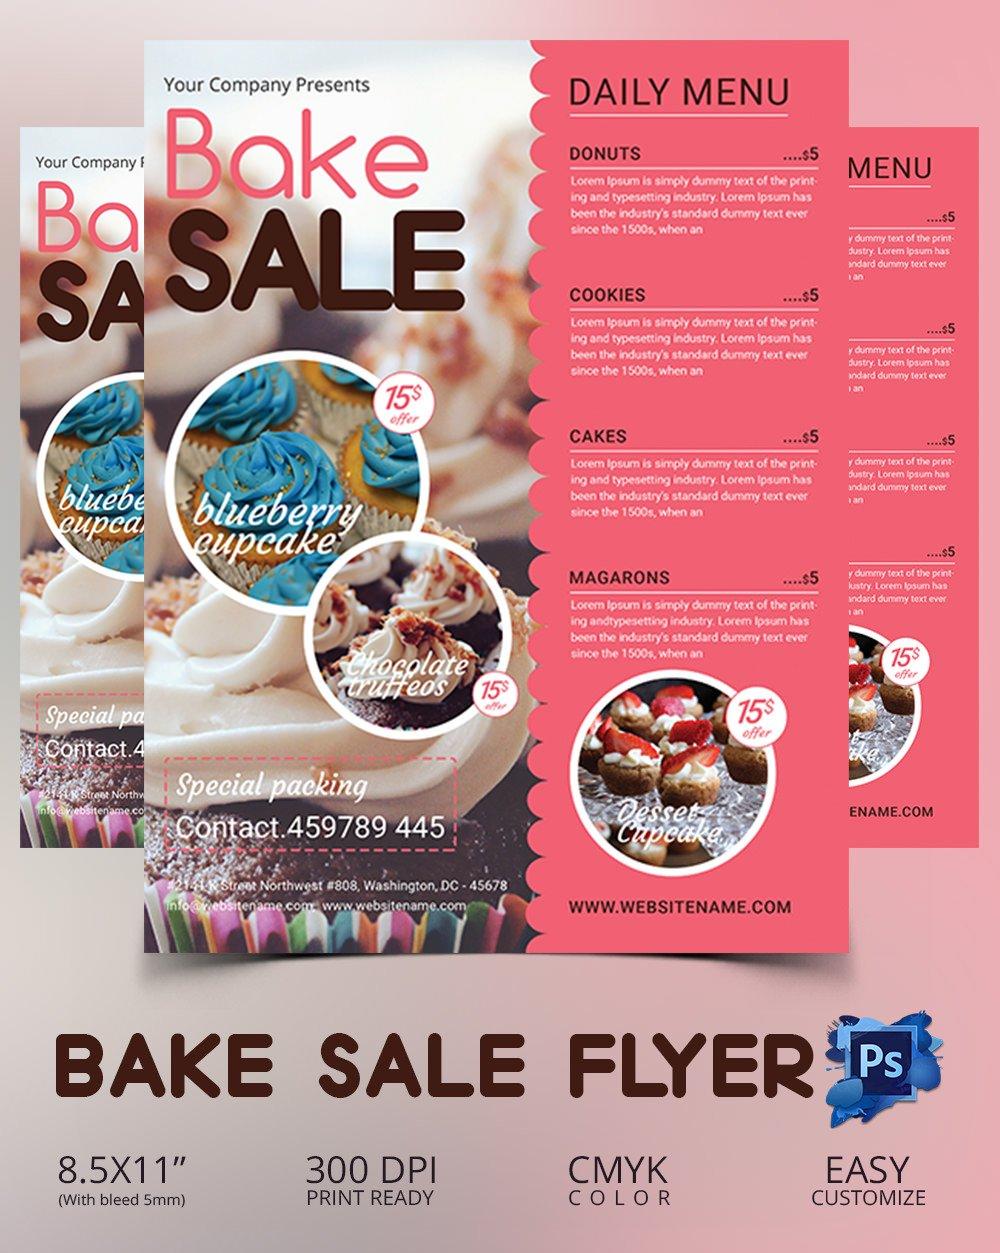 bake sale flyer template   datariouruguay